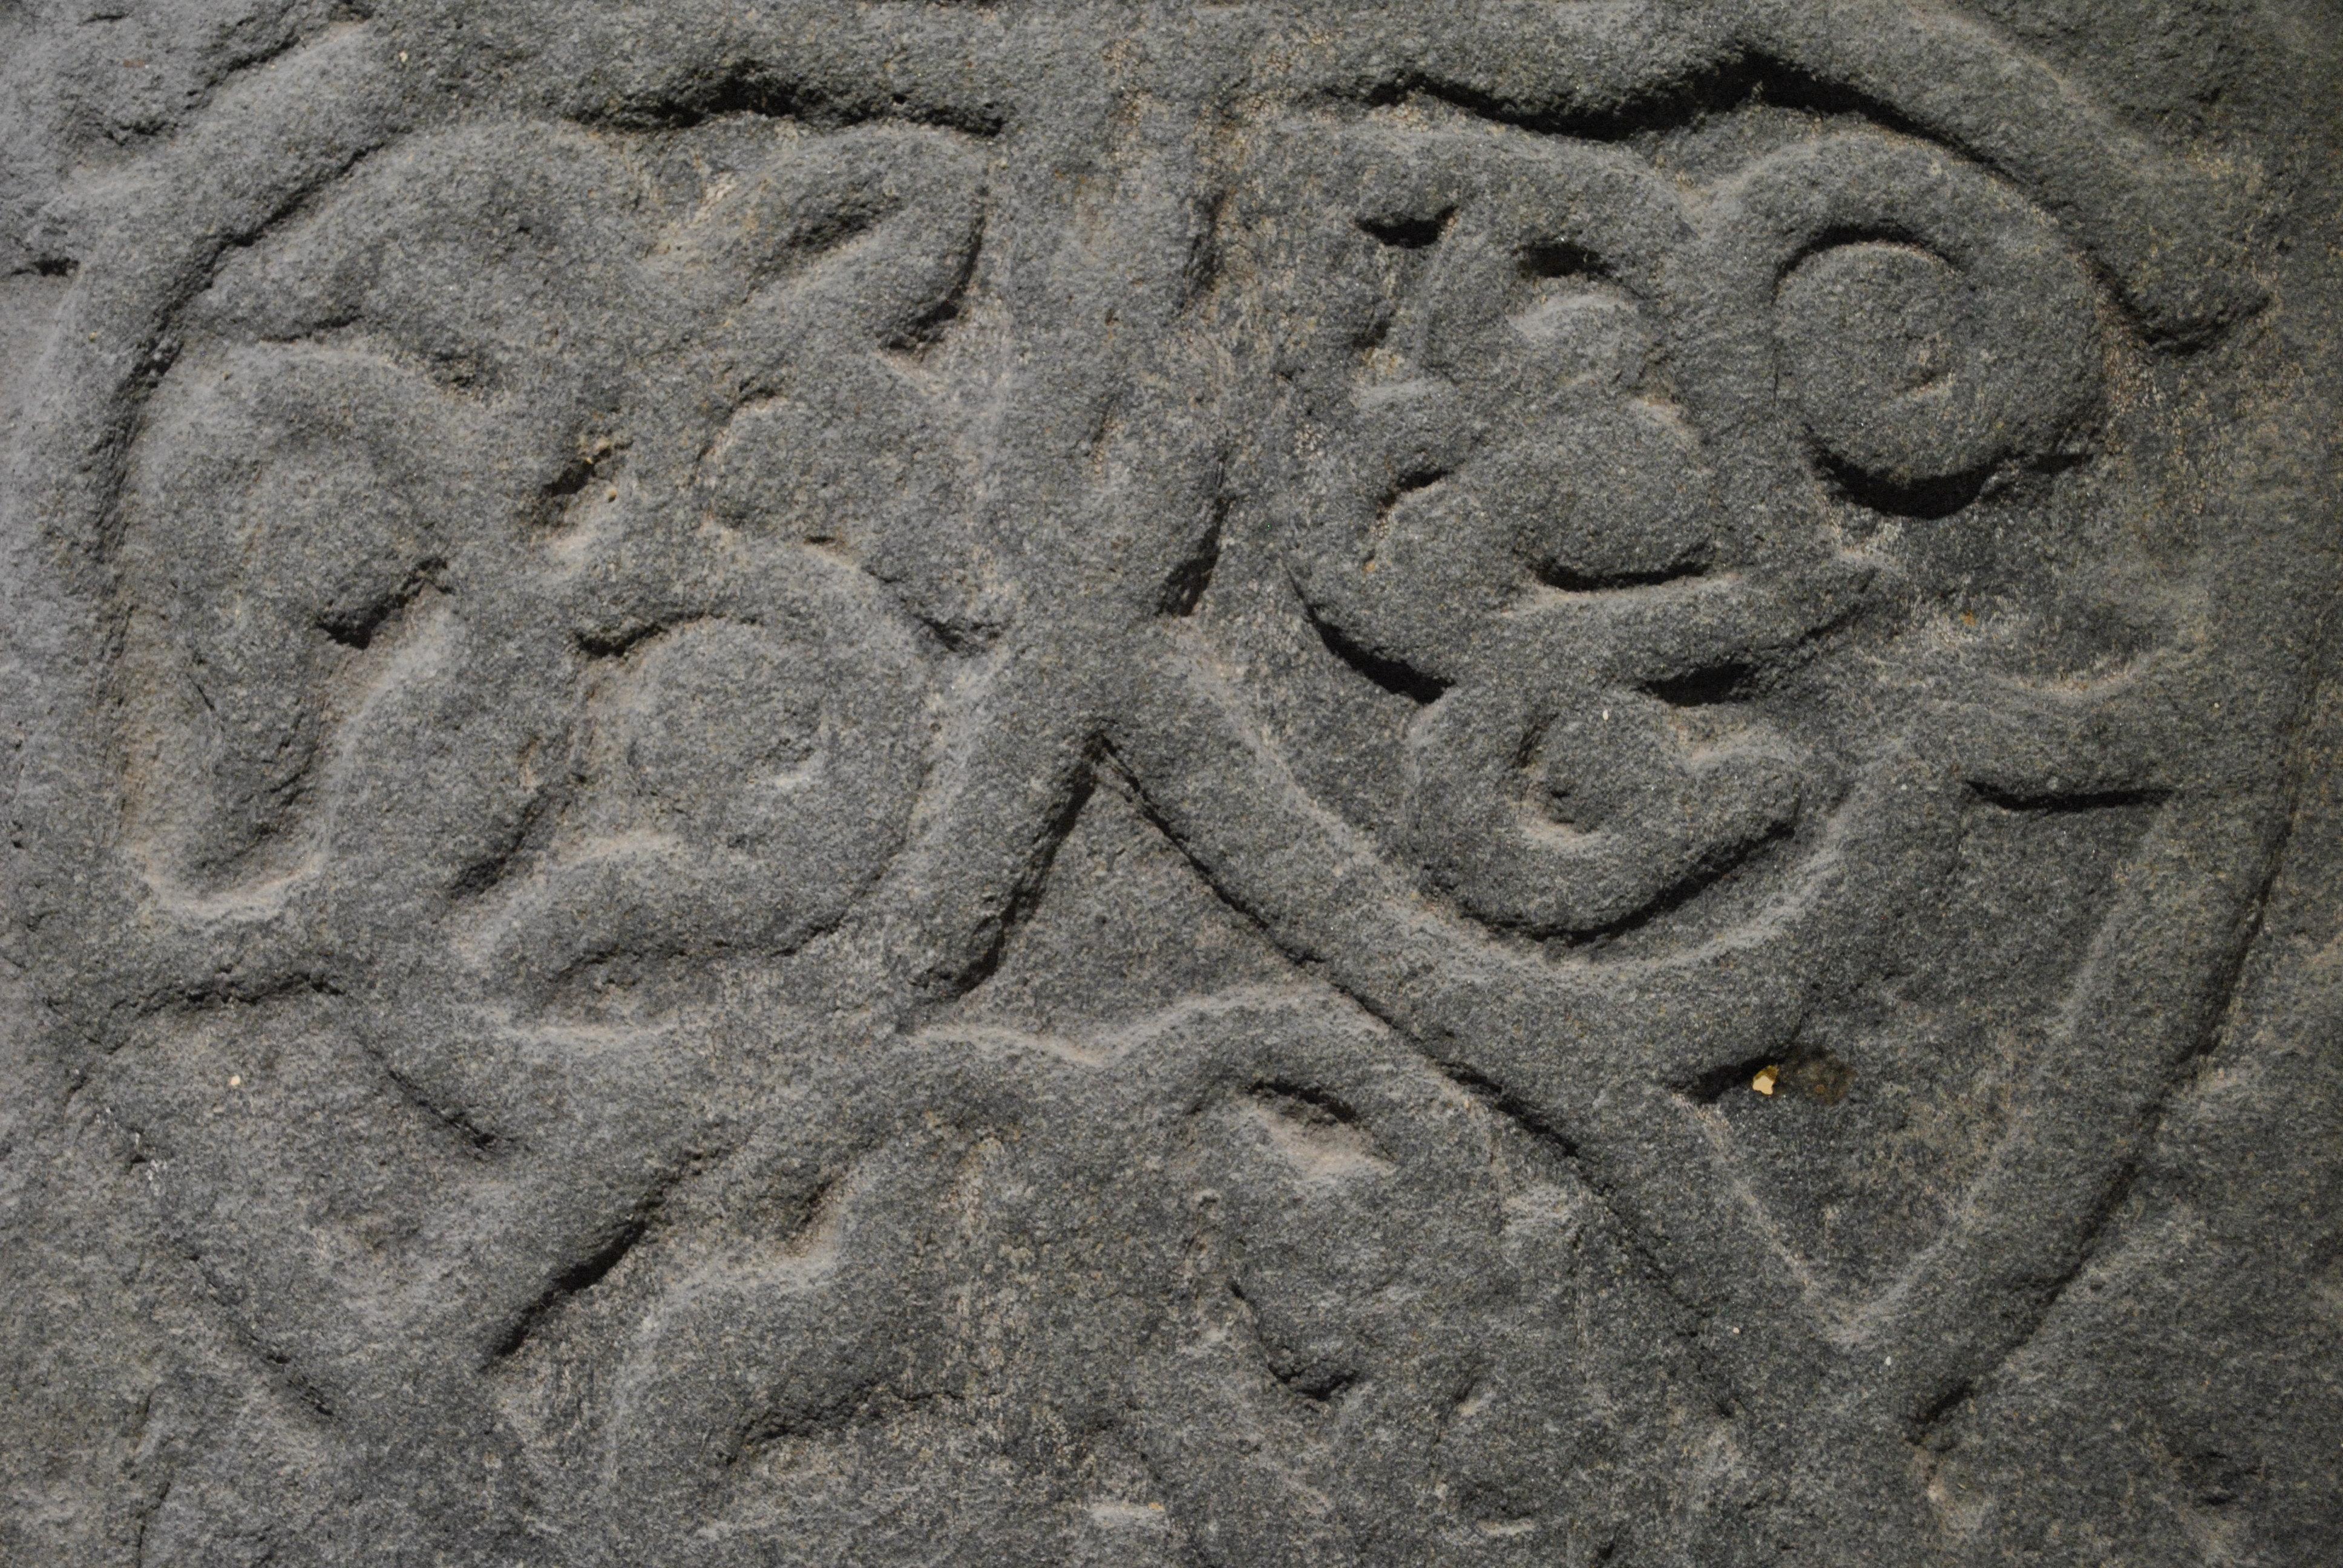 Cill Choluimchille, Lochaline, Morvern, Scotland